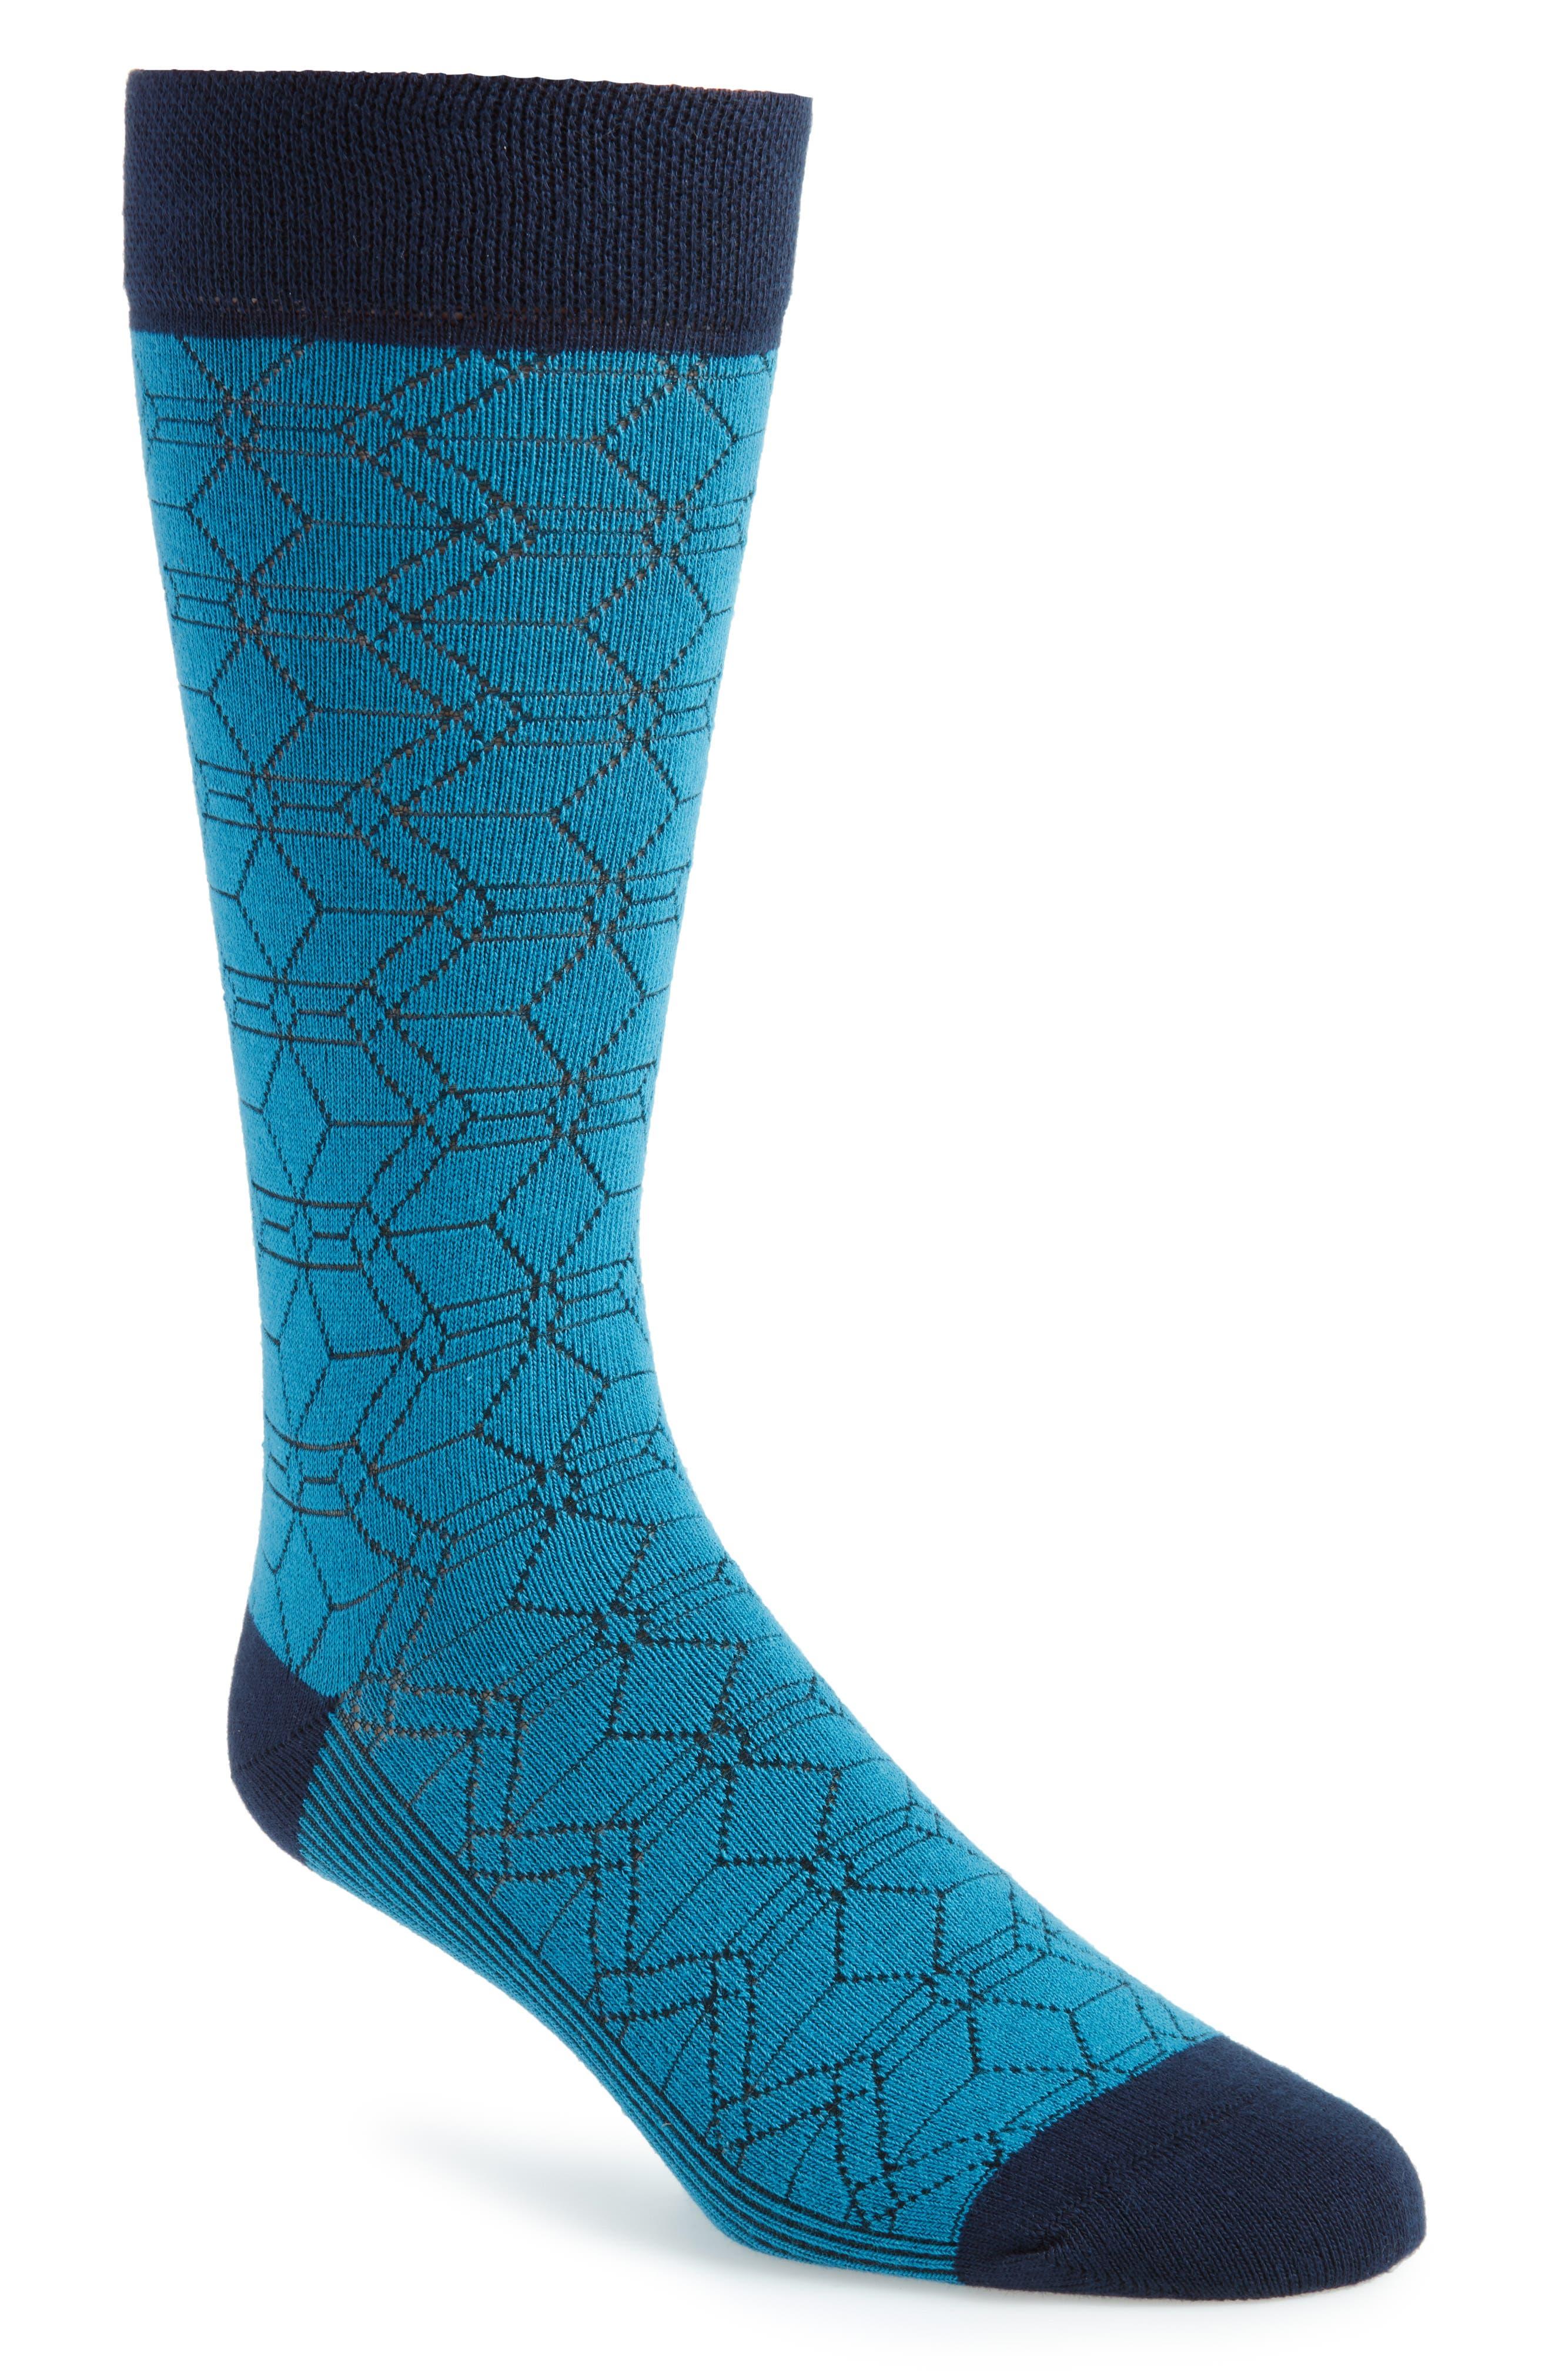 Geo Socks,                         Main,                         color, 421